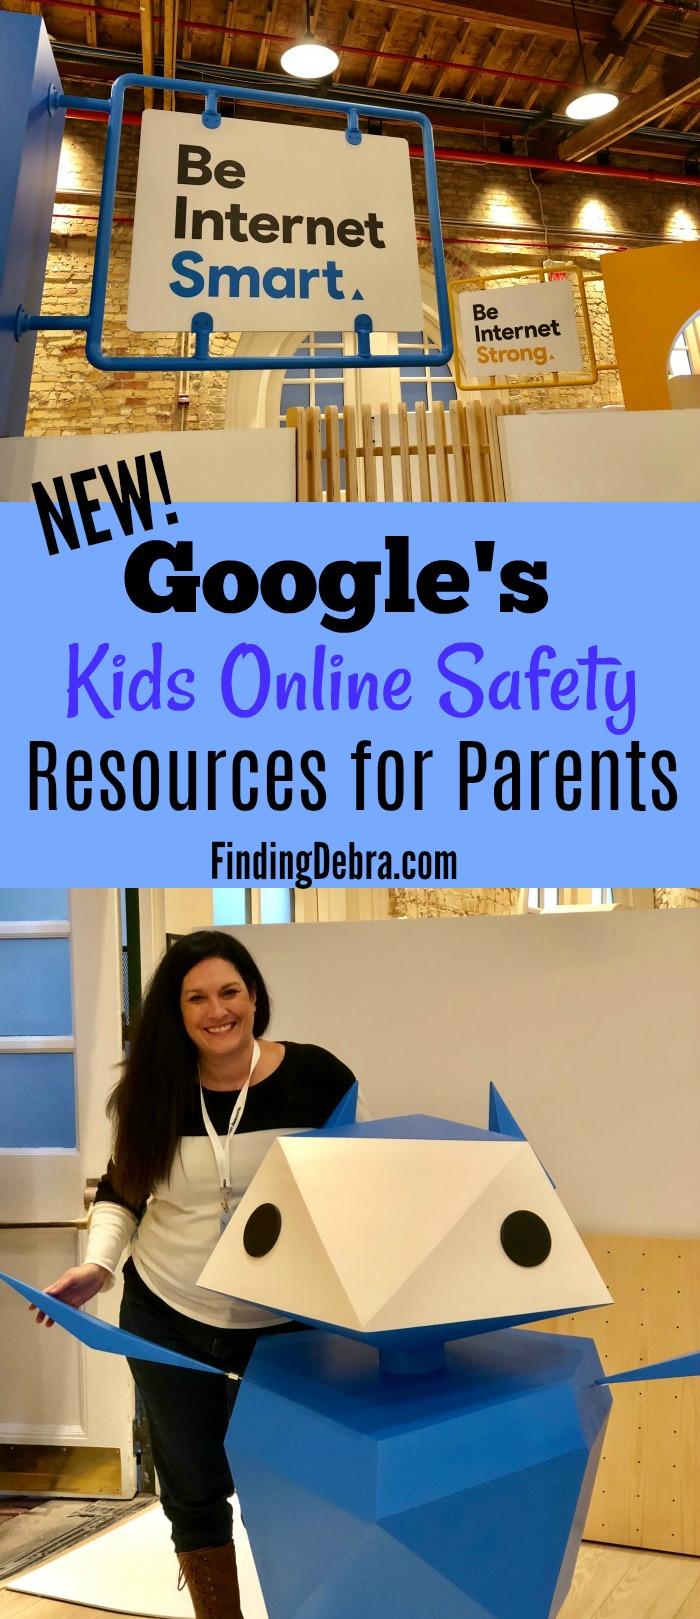 Google's Kids Online Safety Resources for Parents